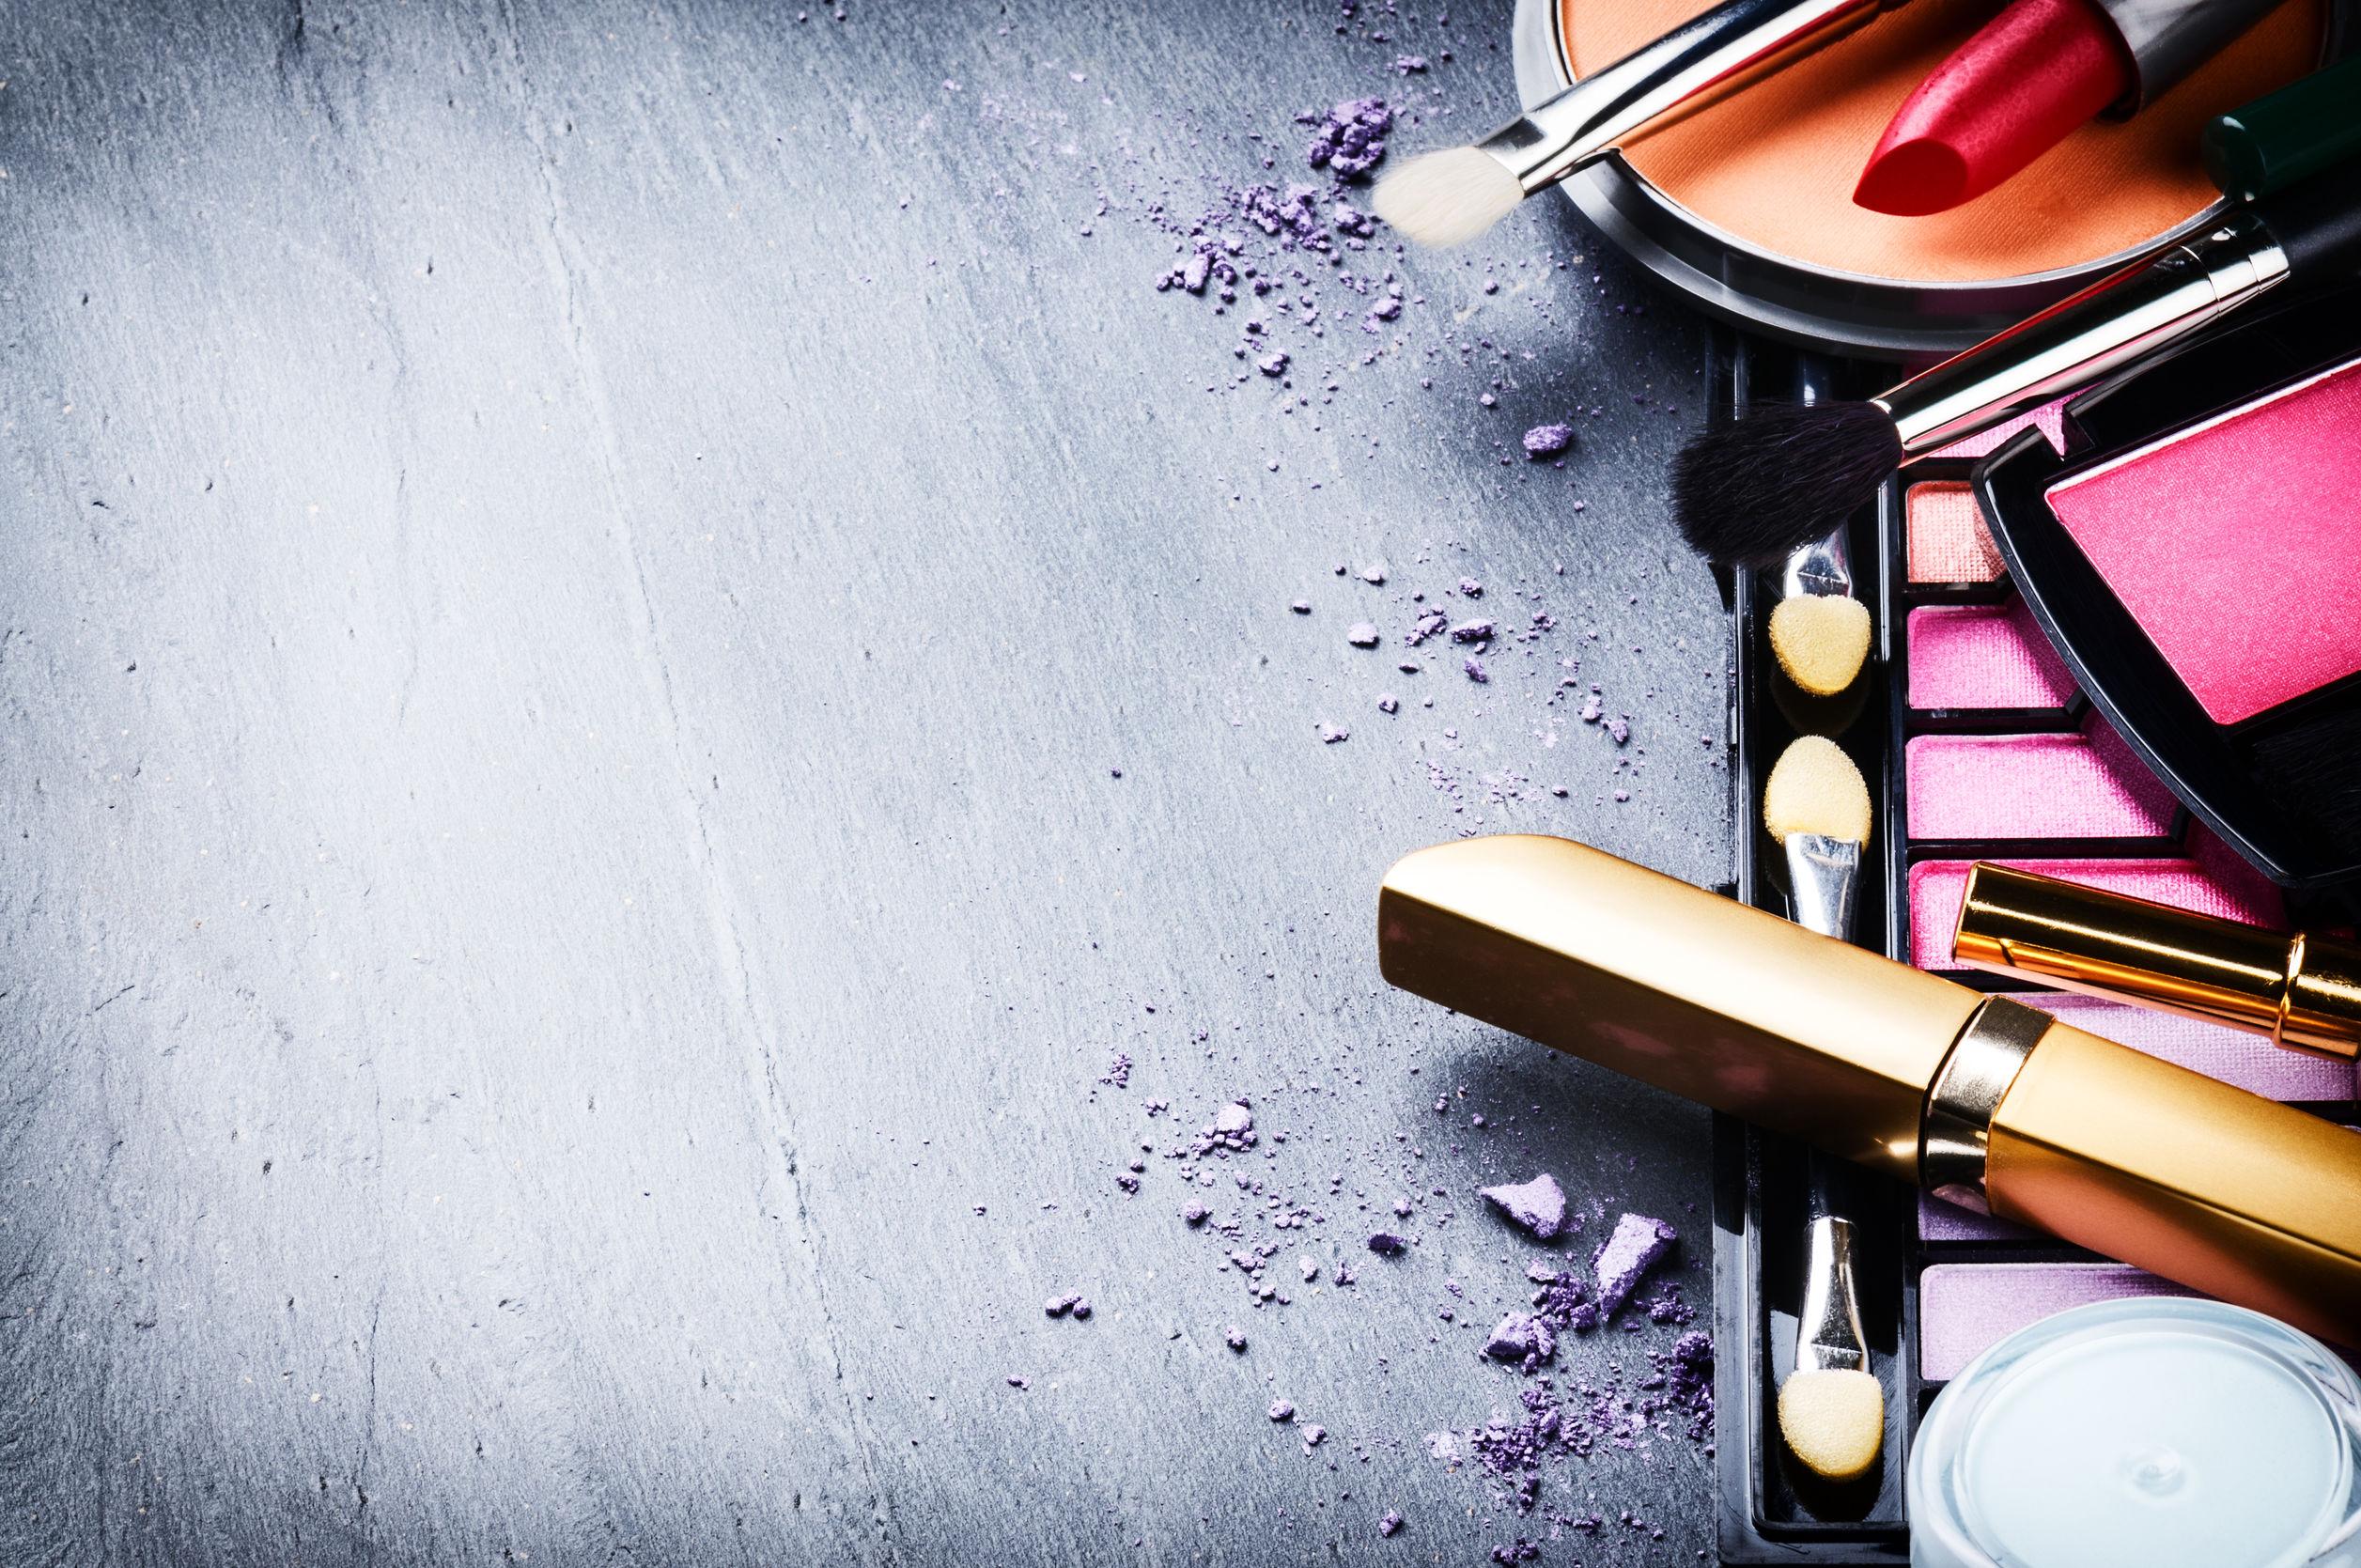 001400b6845c3d Elas Kosmetik & Wellness - Kosmetikstudio & Massagestudio in ...